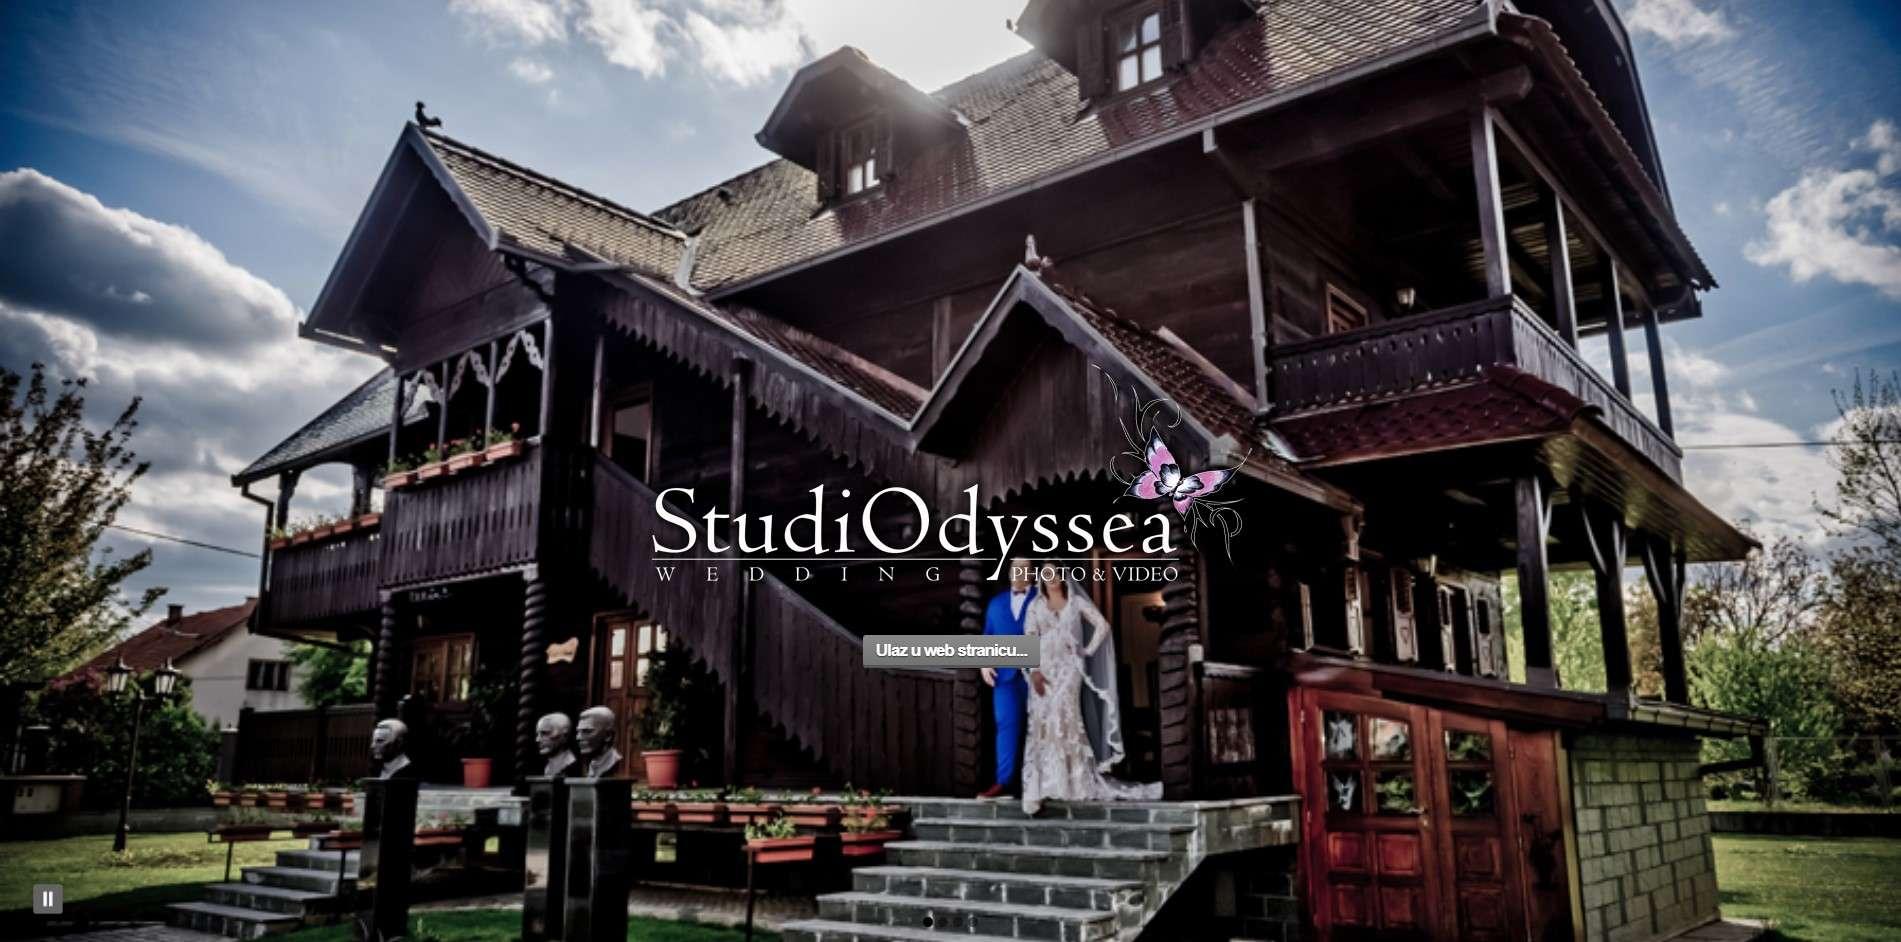 Foto Studio Odyssea